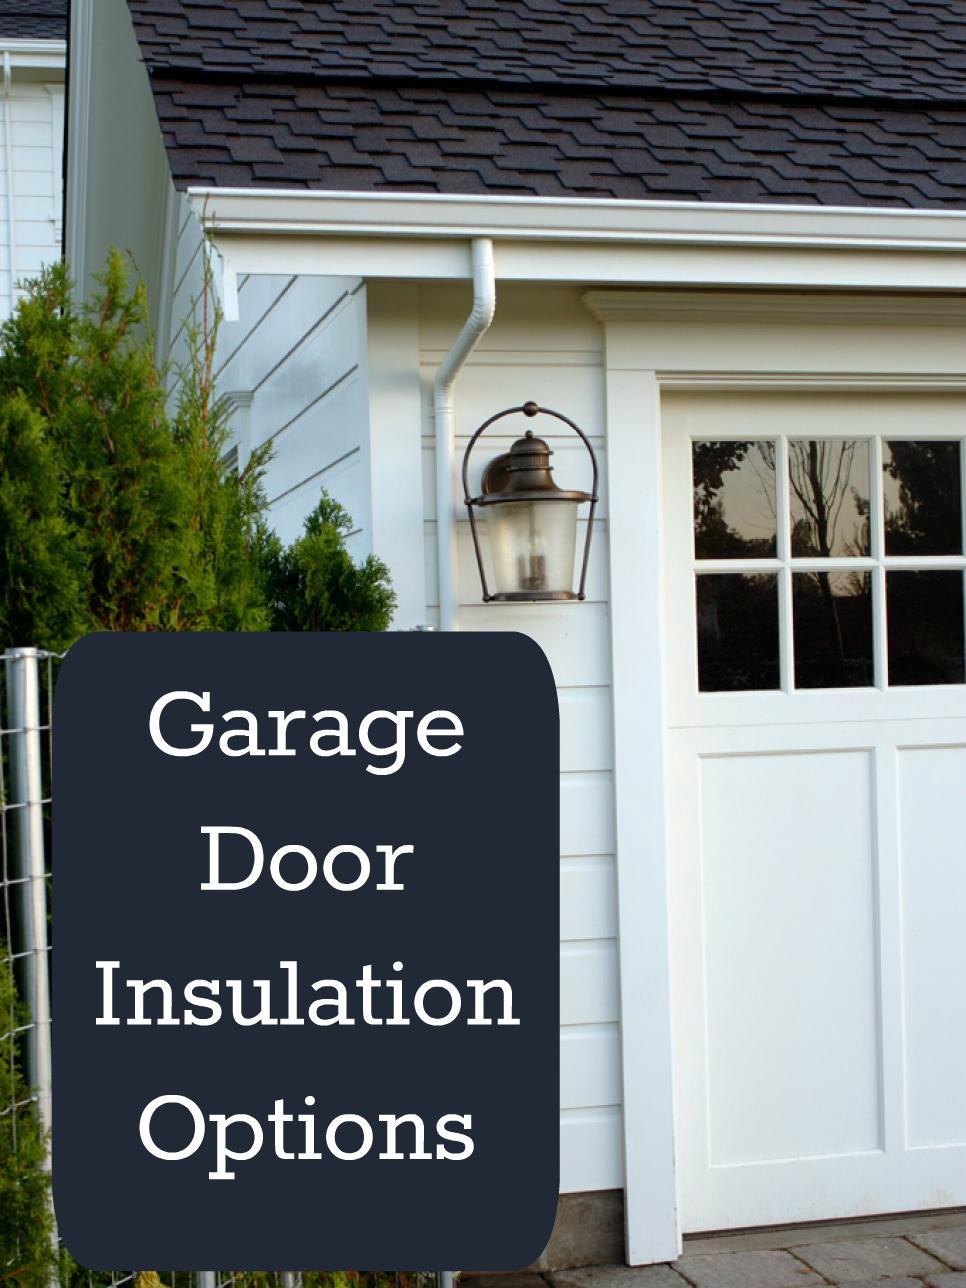 Polyurethane Vs Polystyrene Insulation For Your Garage Doors